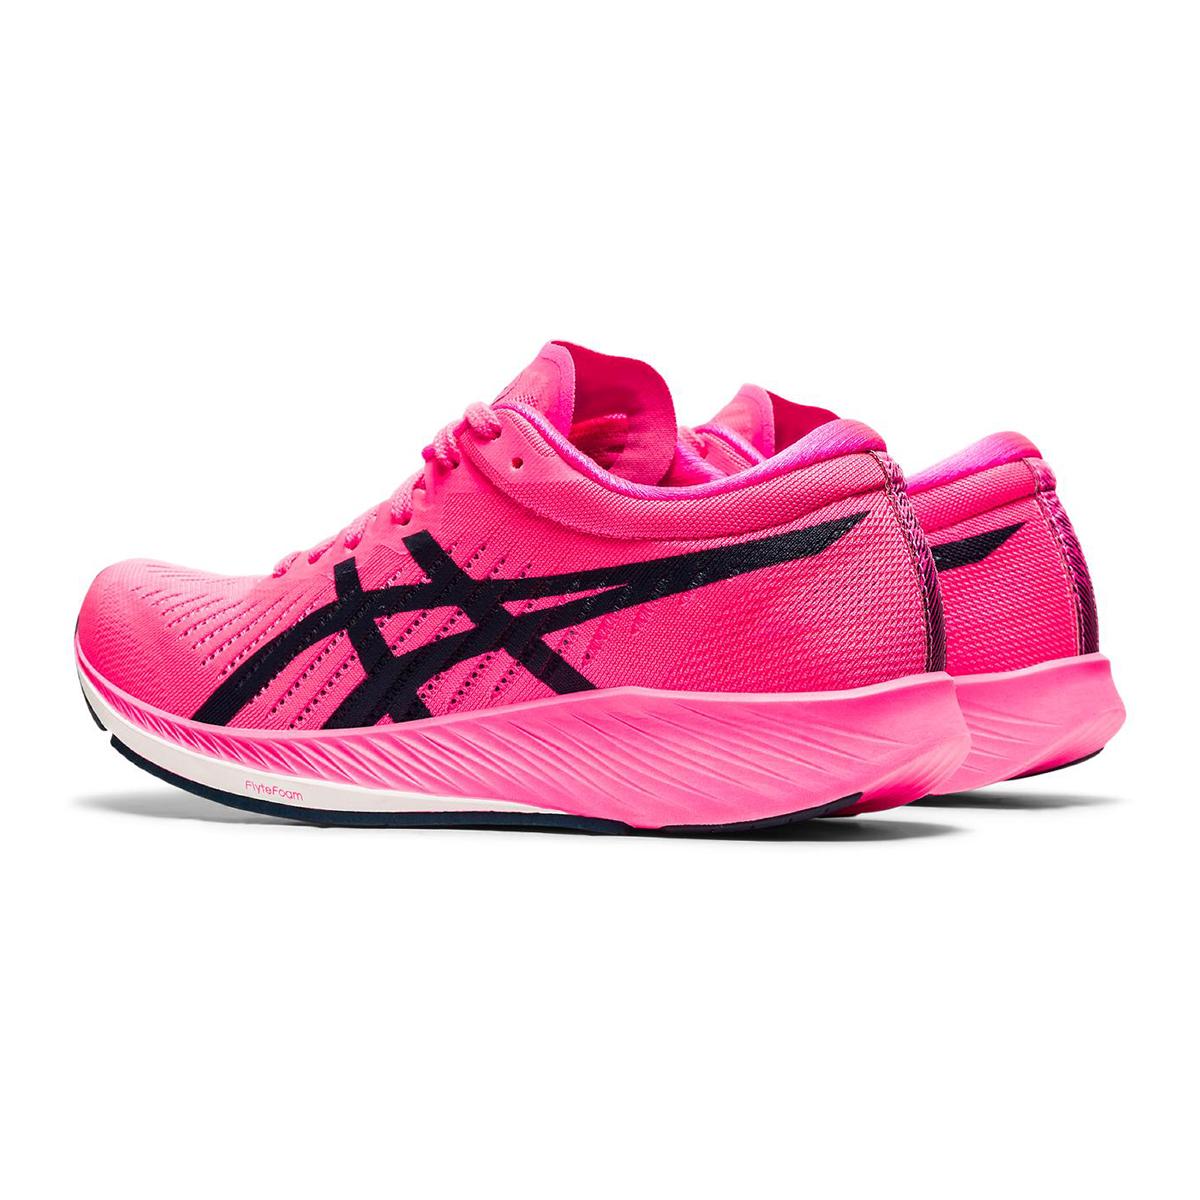 Women's Asics Metaracer Running Shoe - Color: Hot Pink/French Blue - Size: 5 - Width: Regular, Hot Pink/French Blue, large, image 4